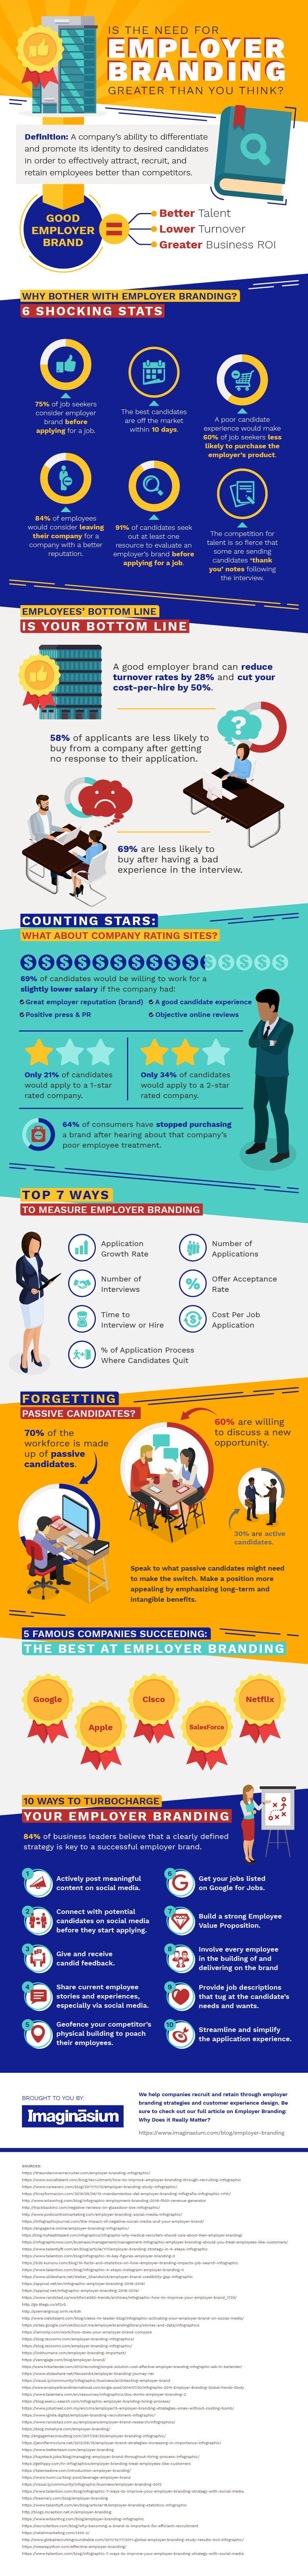 Employer Branding Infographic